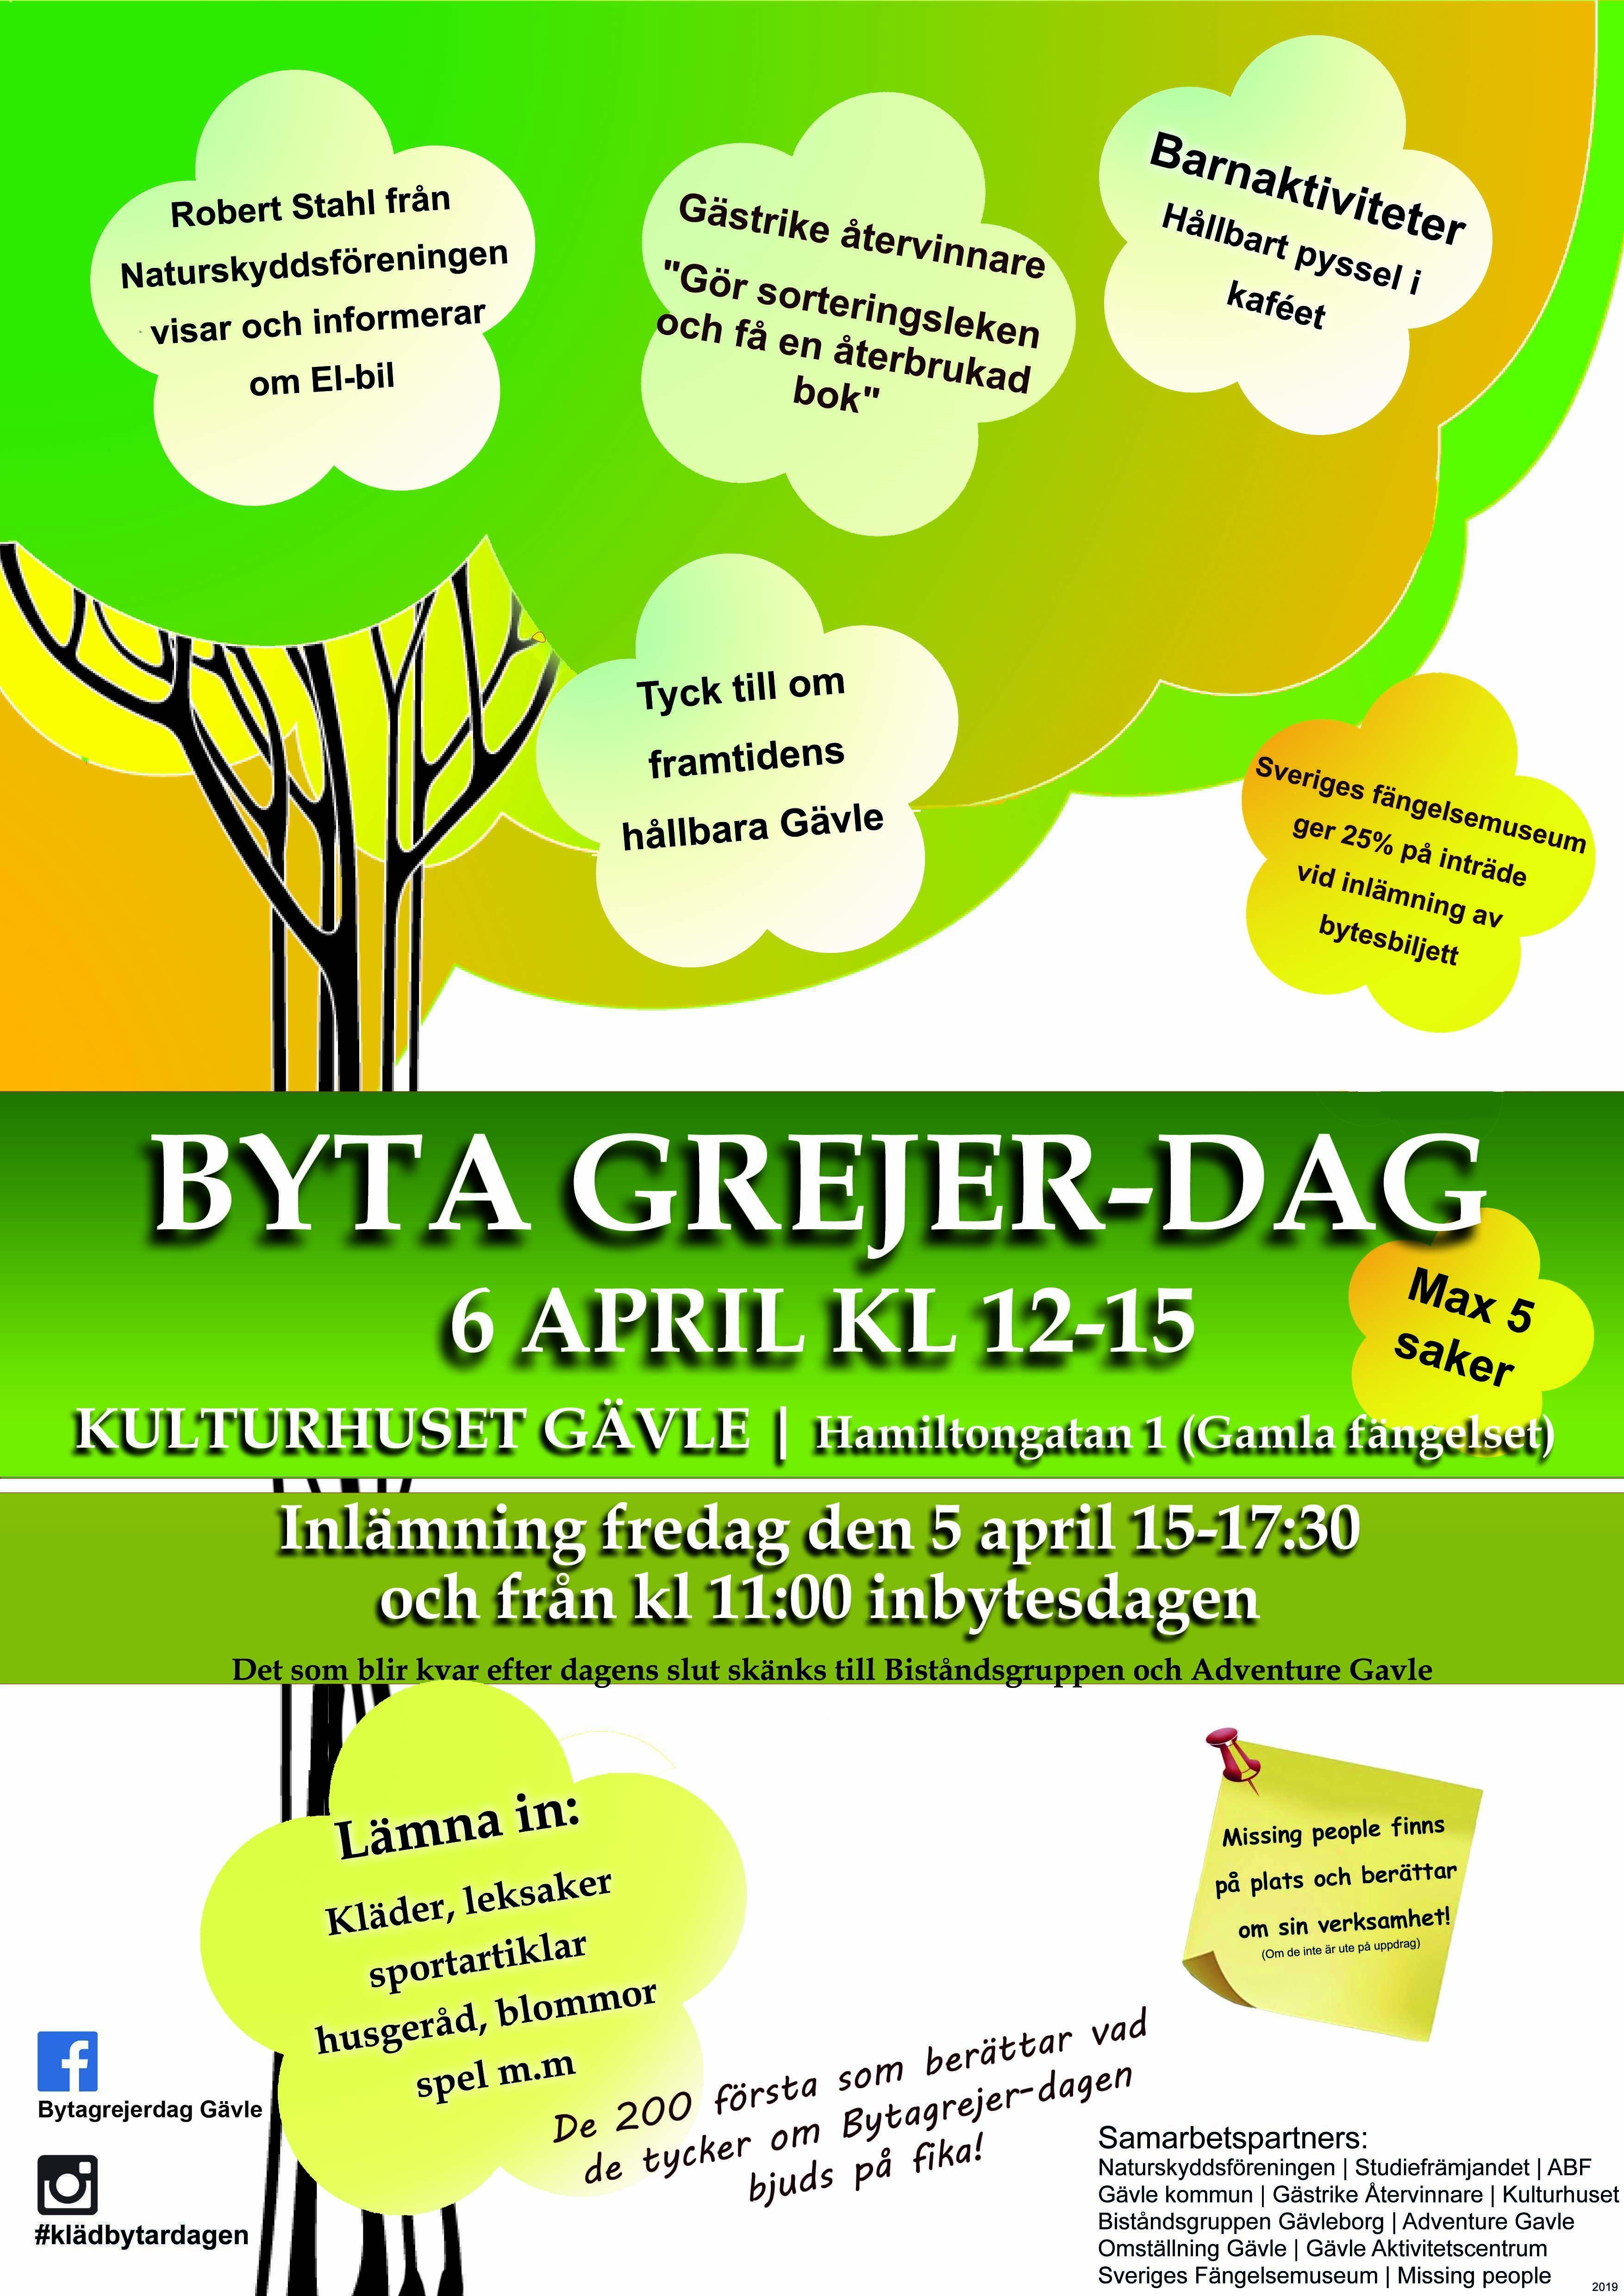 Byta Grejer-Dagen på Kulturhuset Gävle